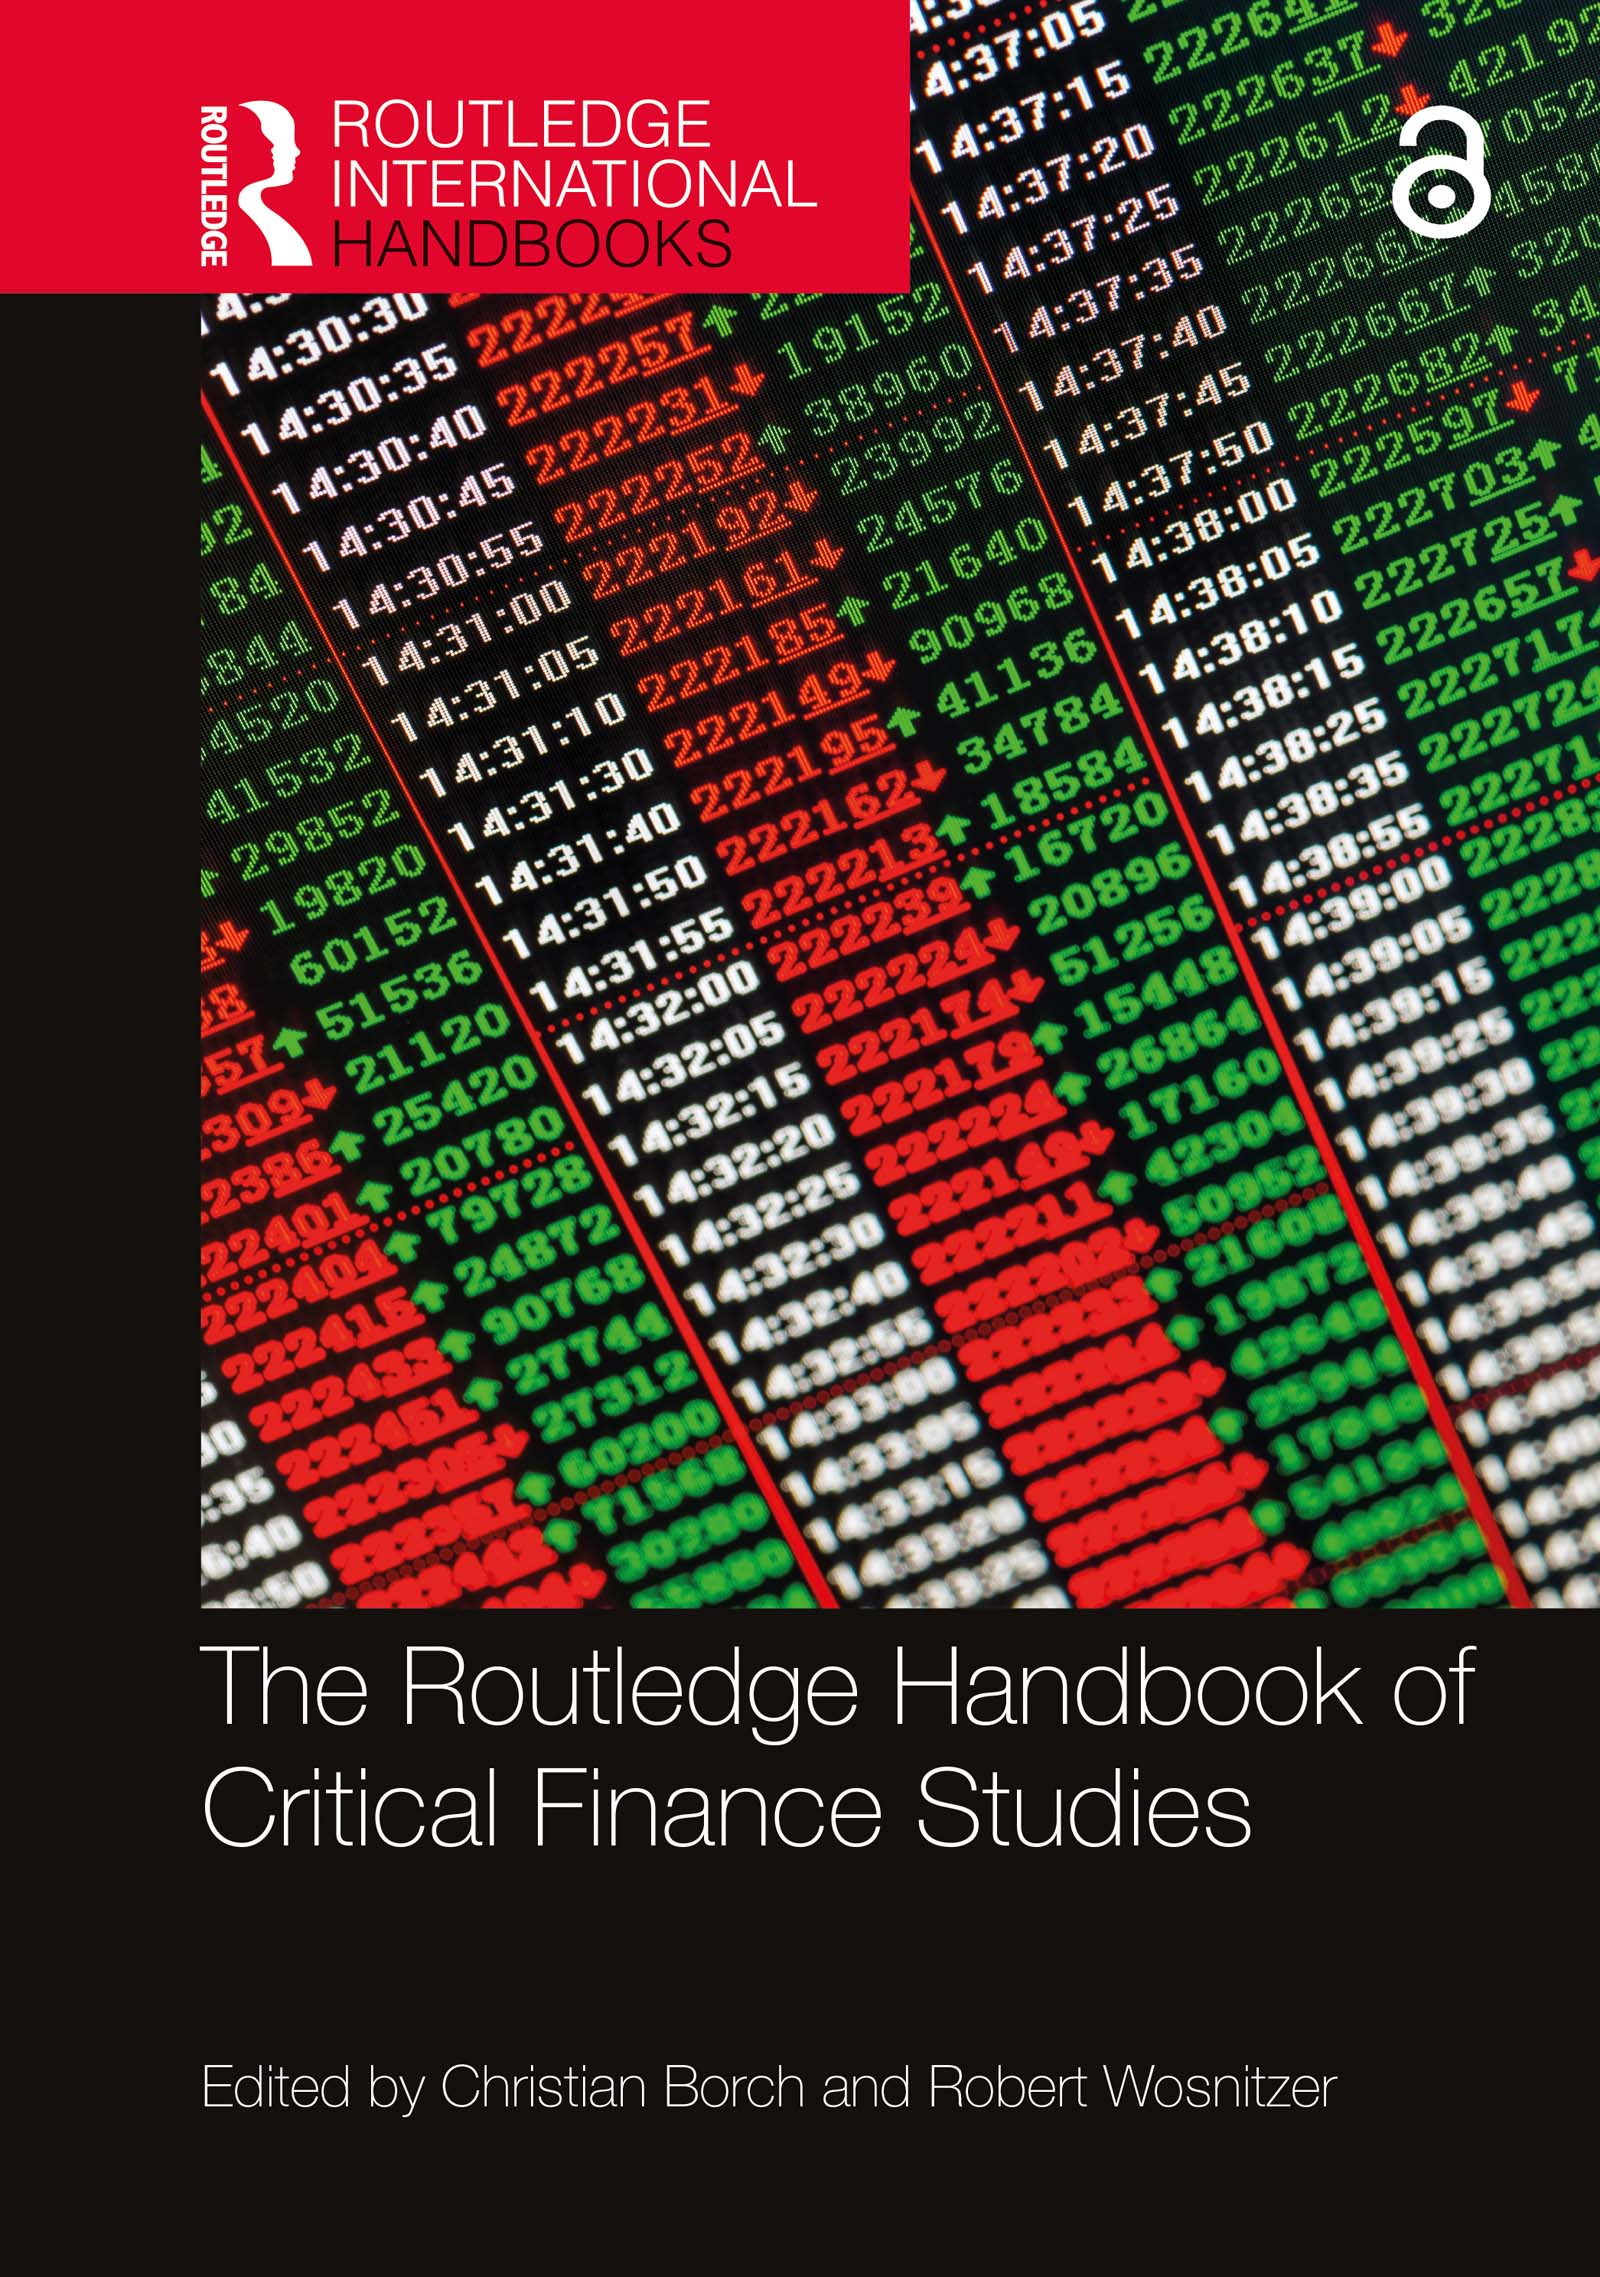 The Routledge Handbook of Critical Finance Studies